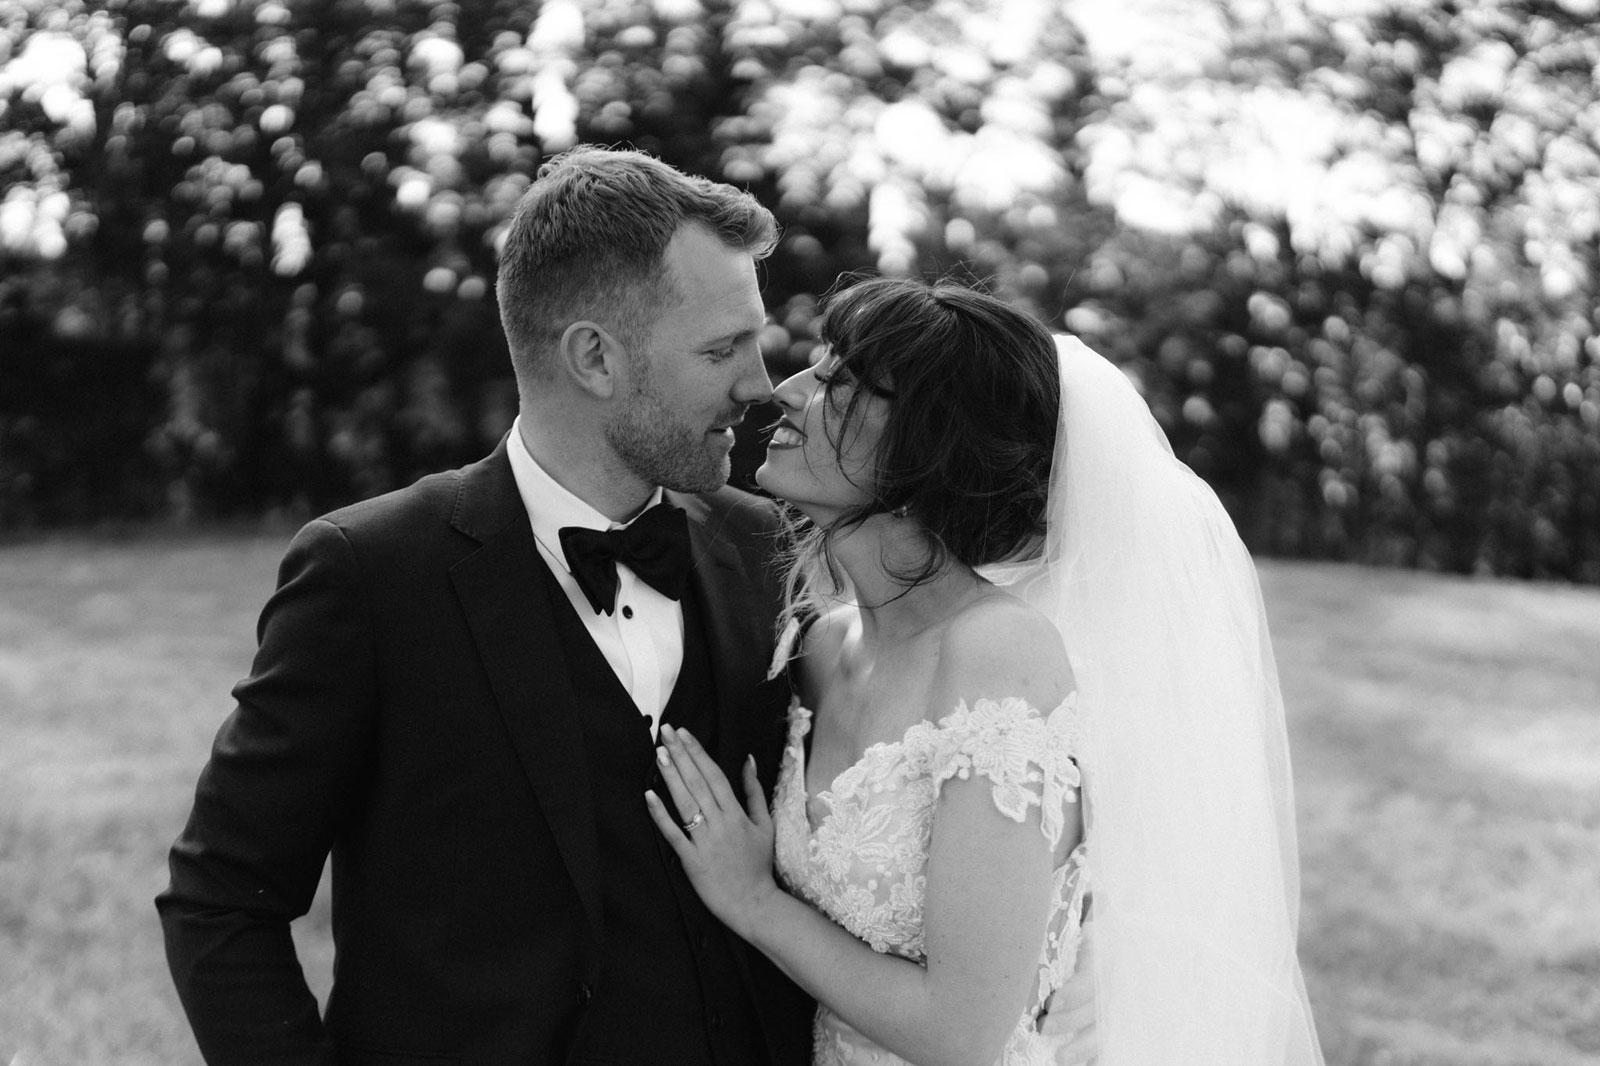 newfound-n-c-olive-tree-cottage-tauranga-wedding-photographer-906